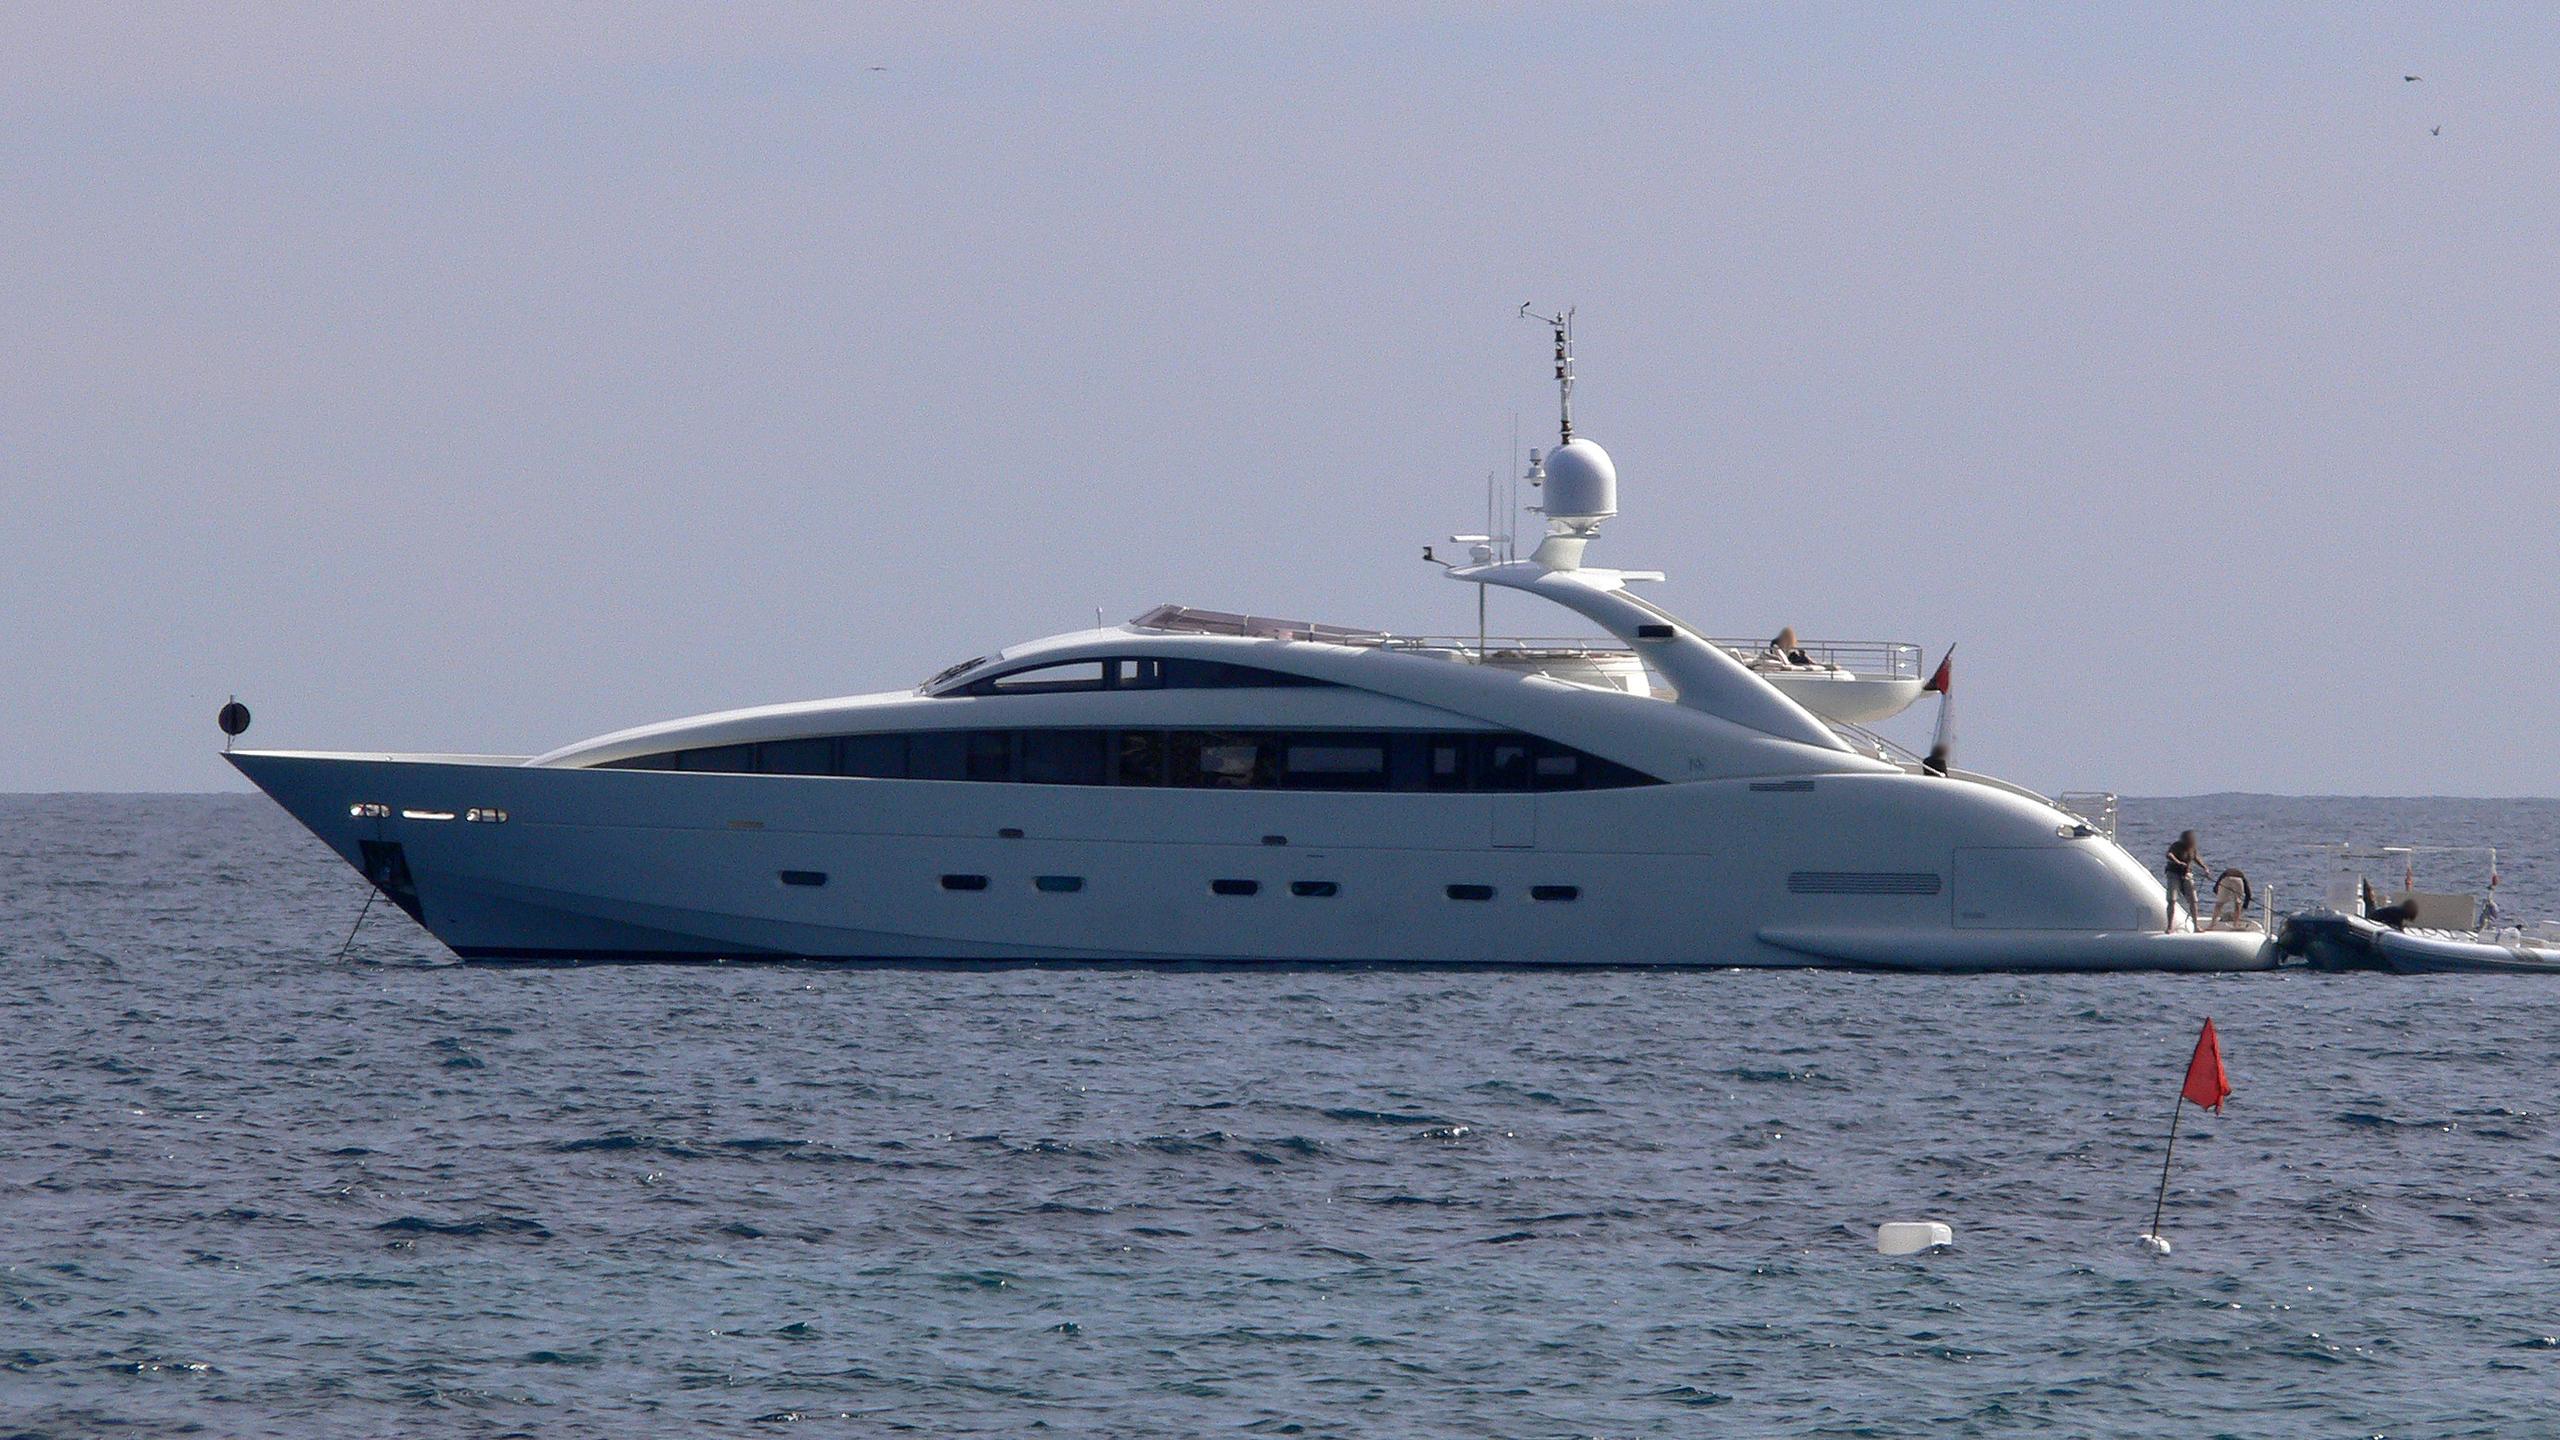 happy-hour-motor-yacht-isa-120-2005-37m-profile